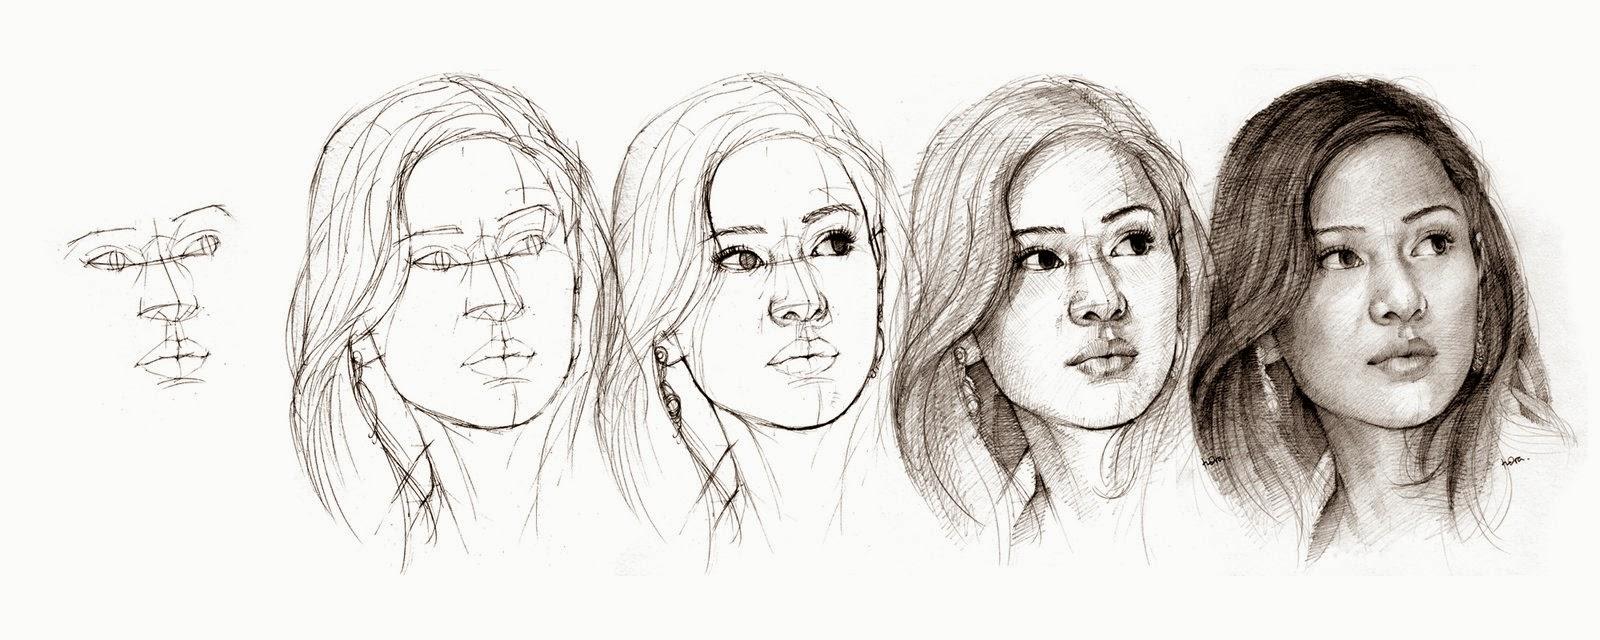 Basics Of Sketching And Drawing ఏ బ్లాగ్ బై మిల్కా పాల్